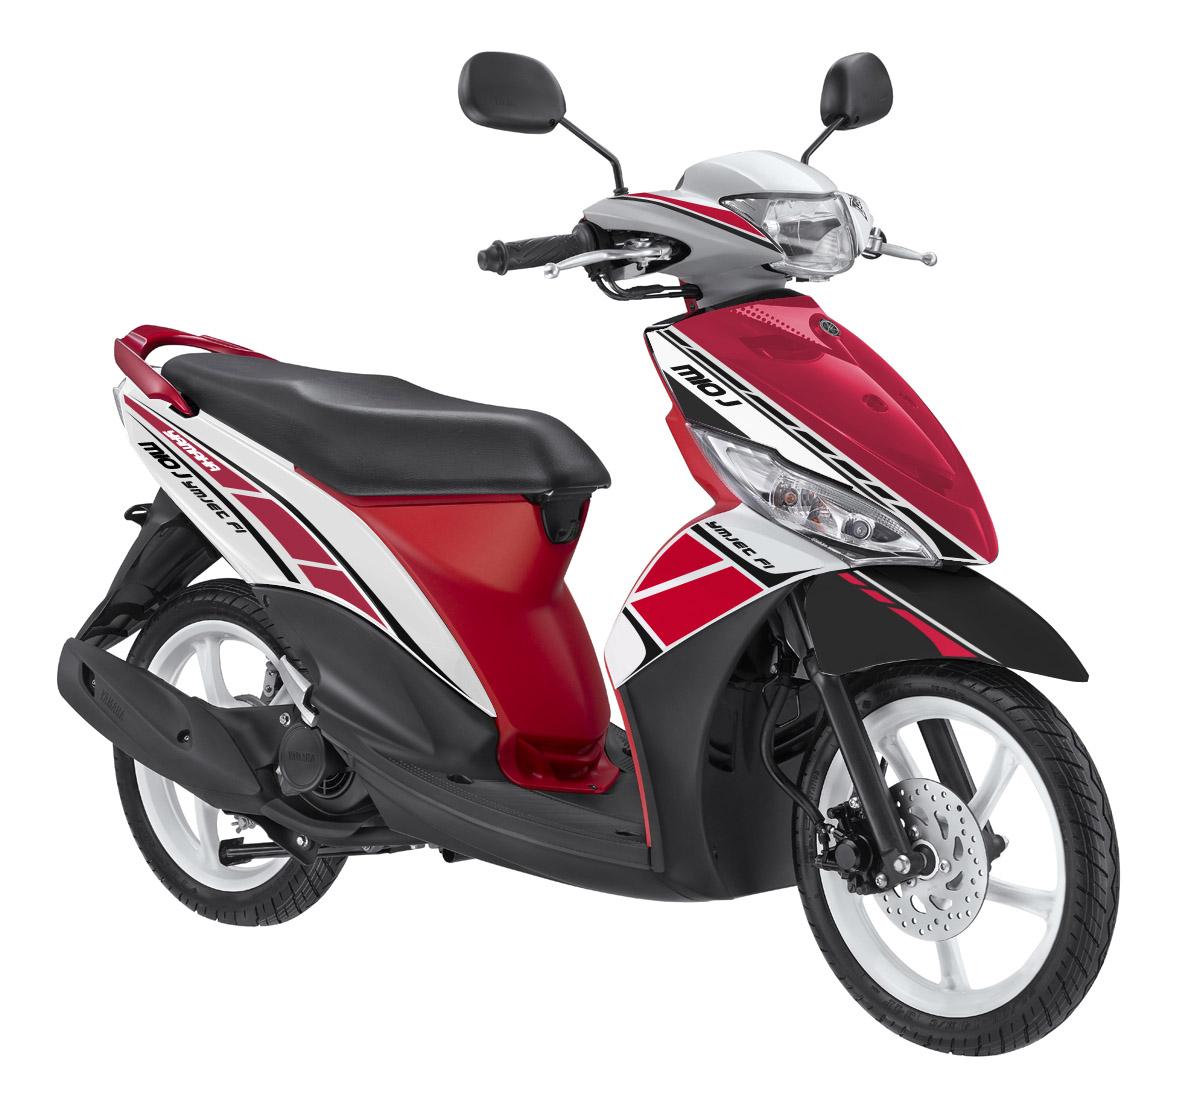 Modifikasi striping Yamaha Mio J 60th Anniversary New